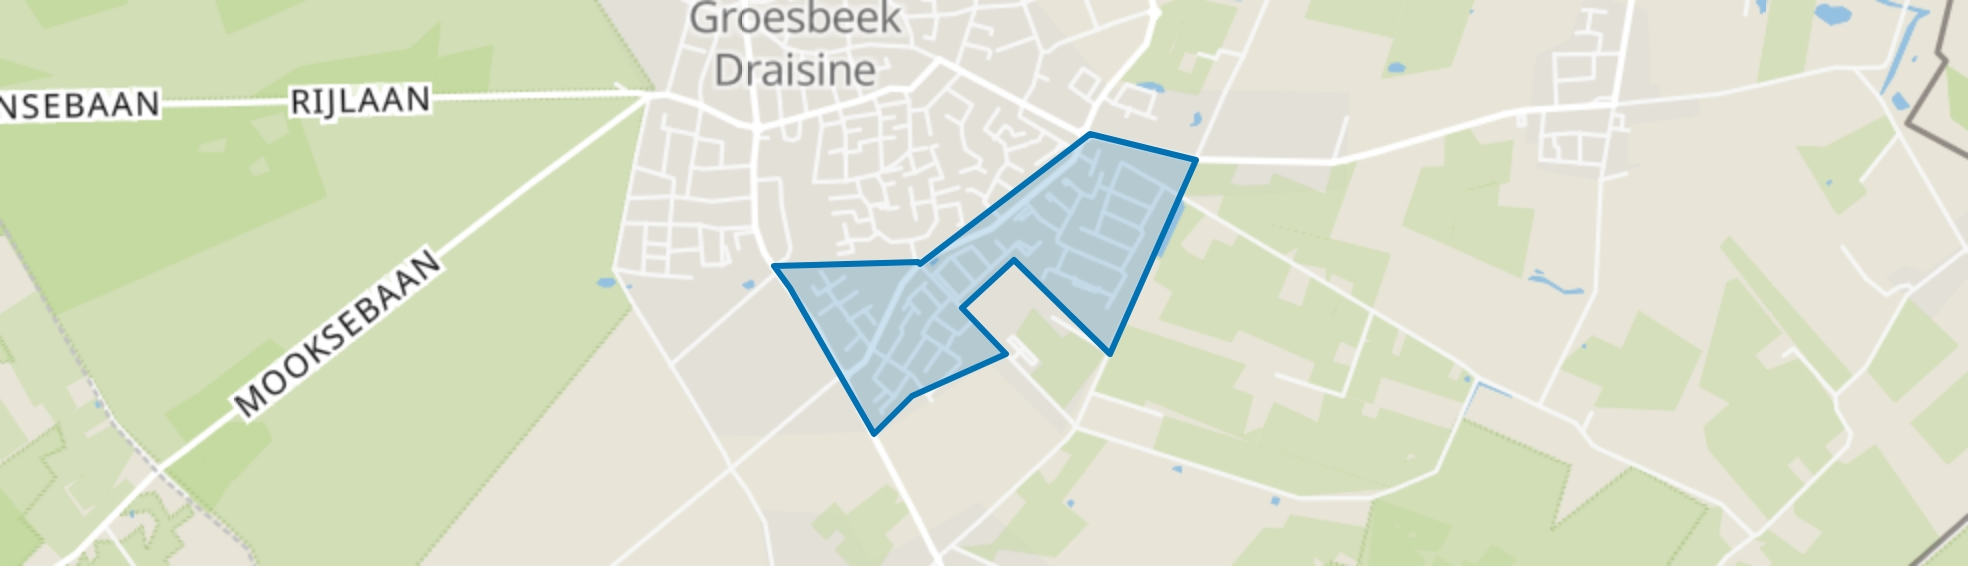 Groesbeek Nijerf, Groesbeek map